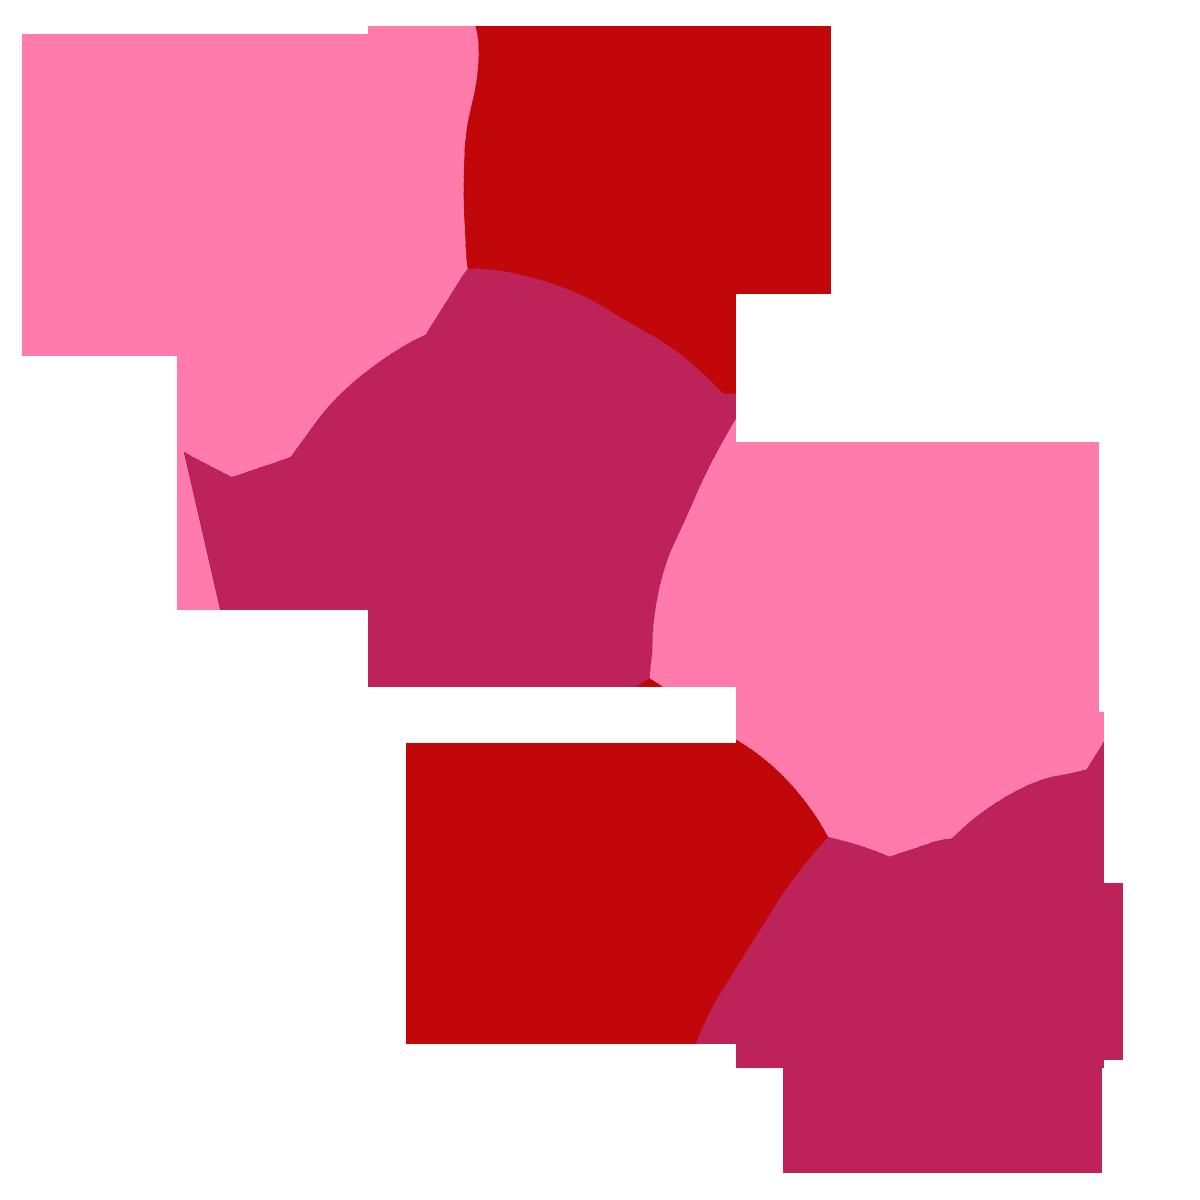 Hearts clipart Images heart Clipartix clipart large